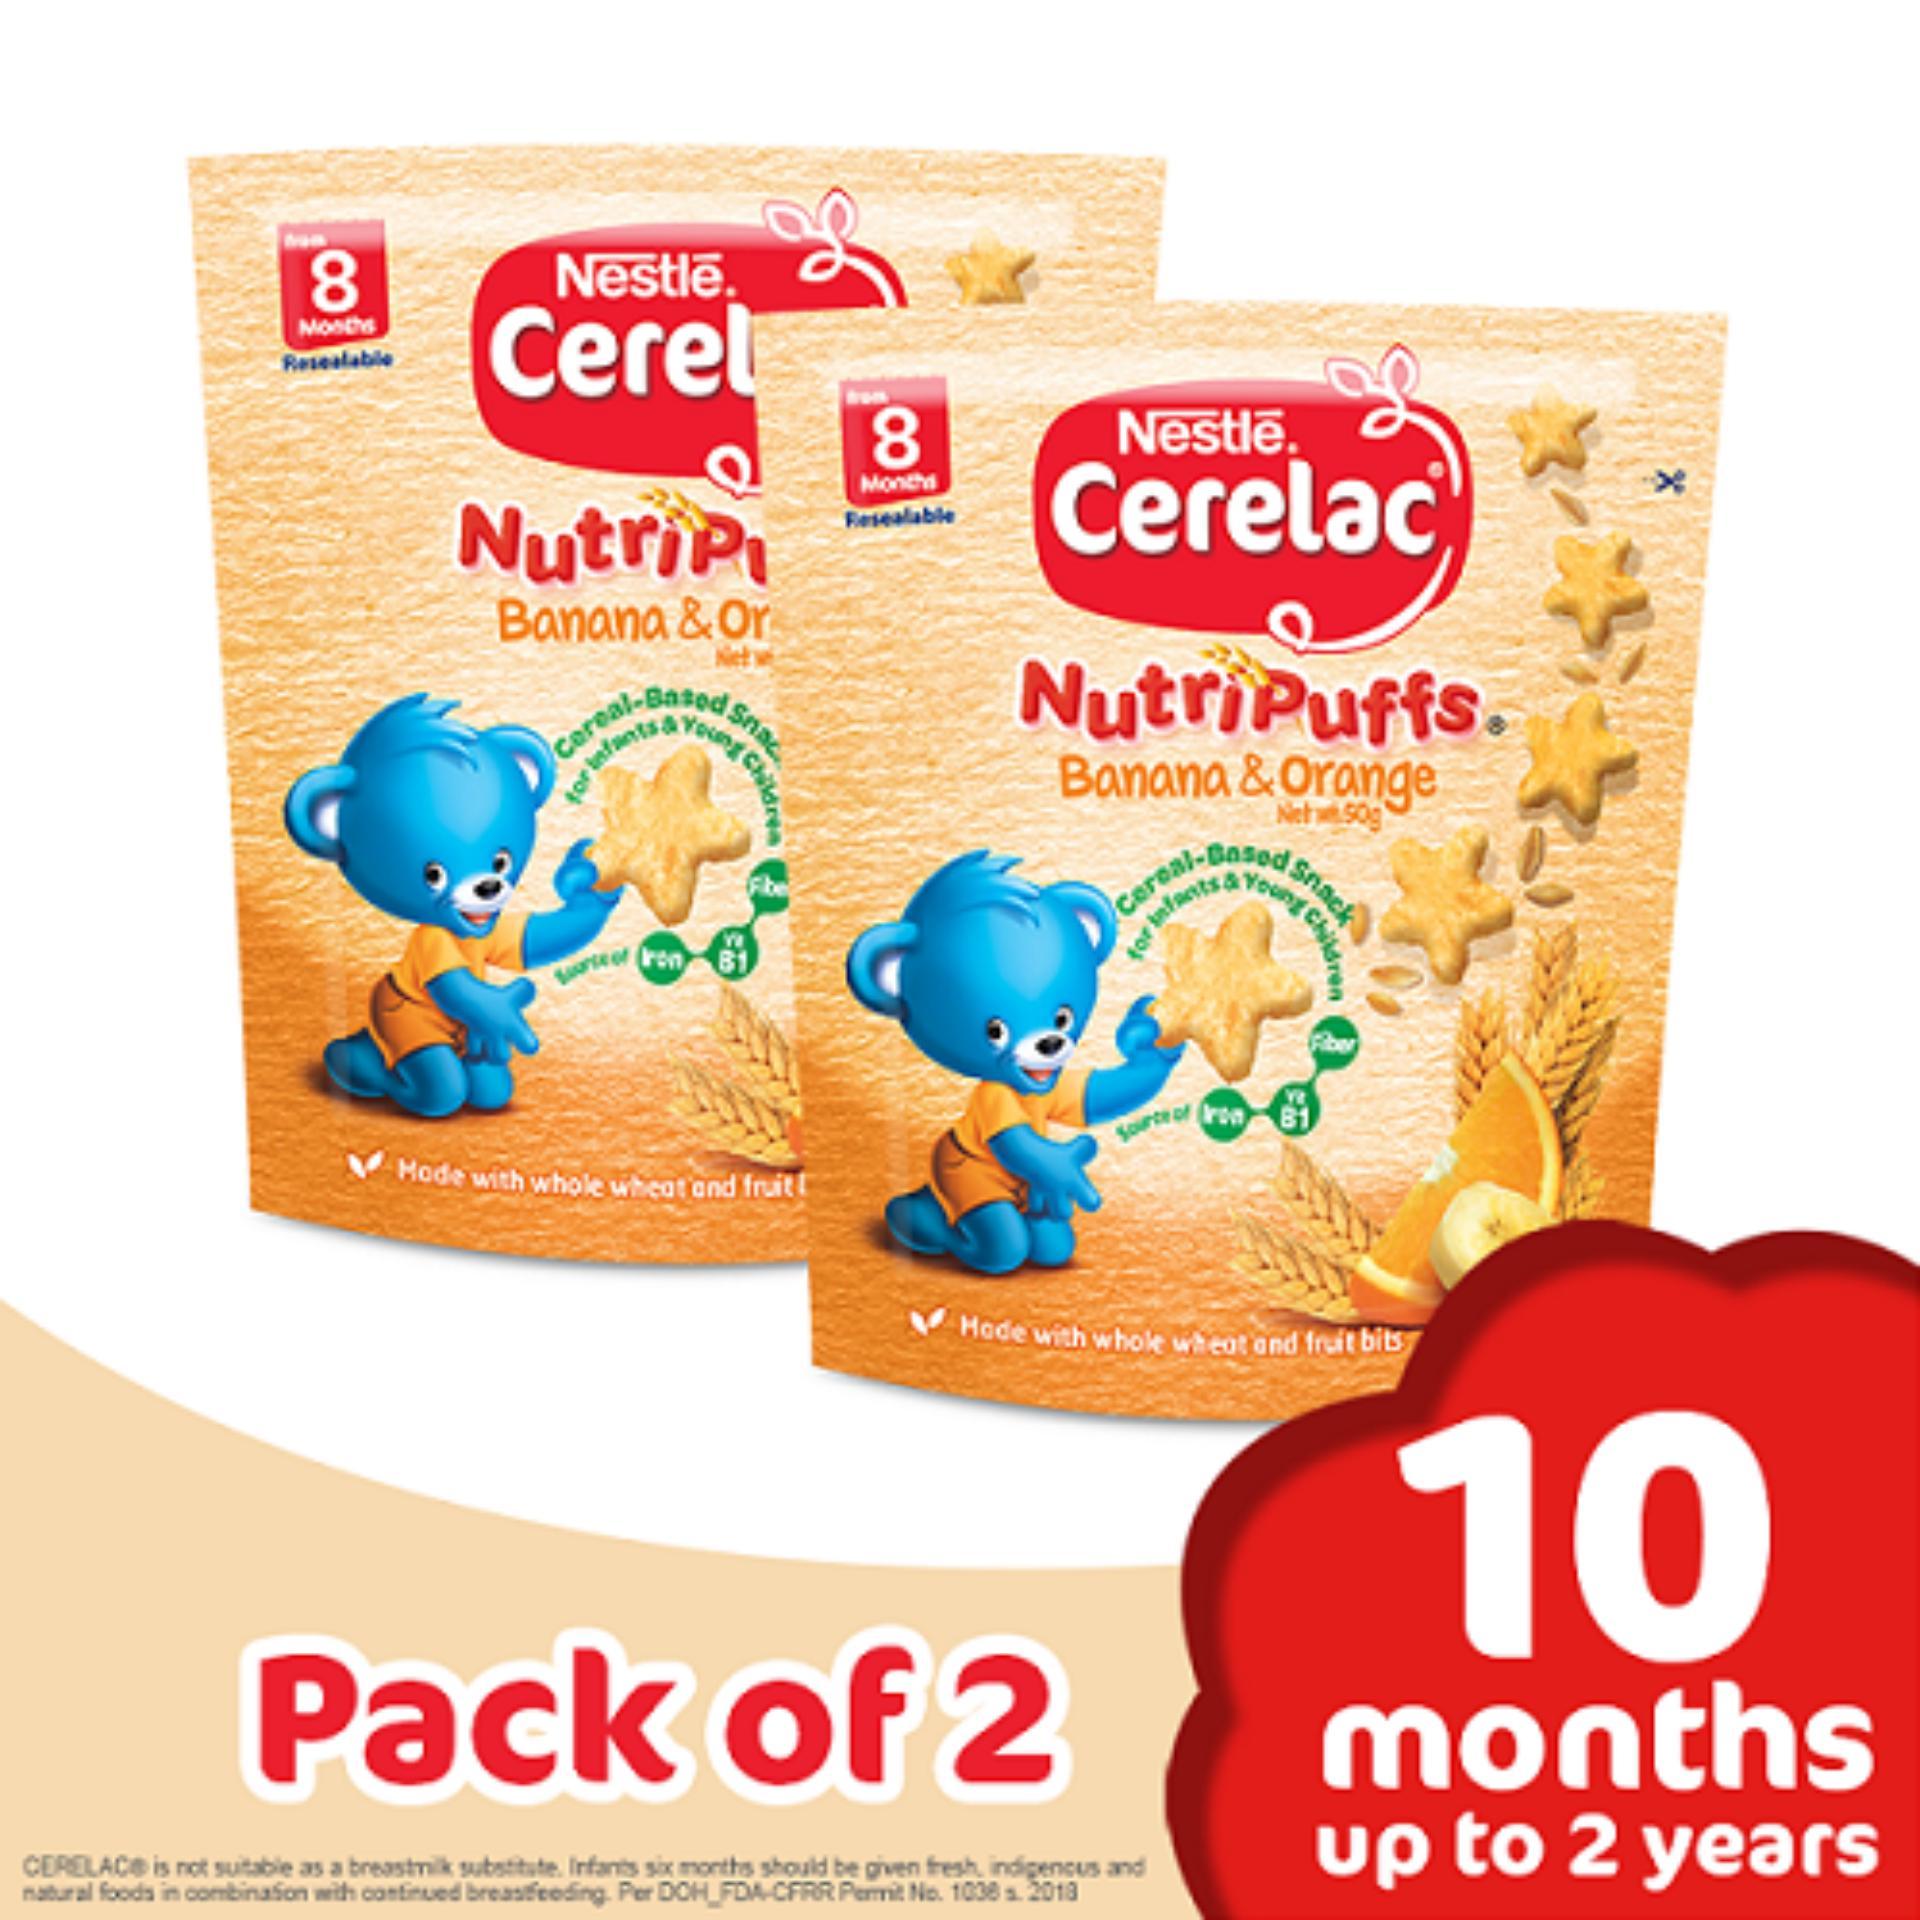 6c1fcab317dd Baby Food for sale - Organic Baby Food online brands